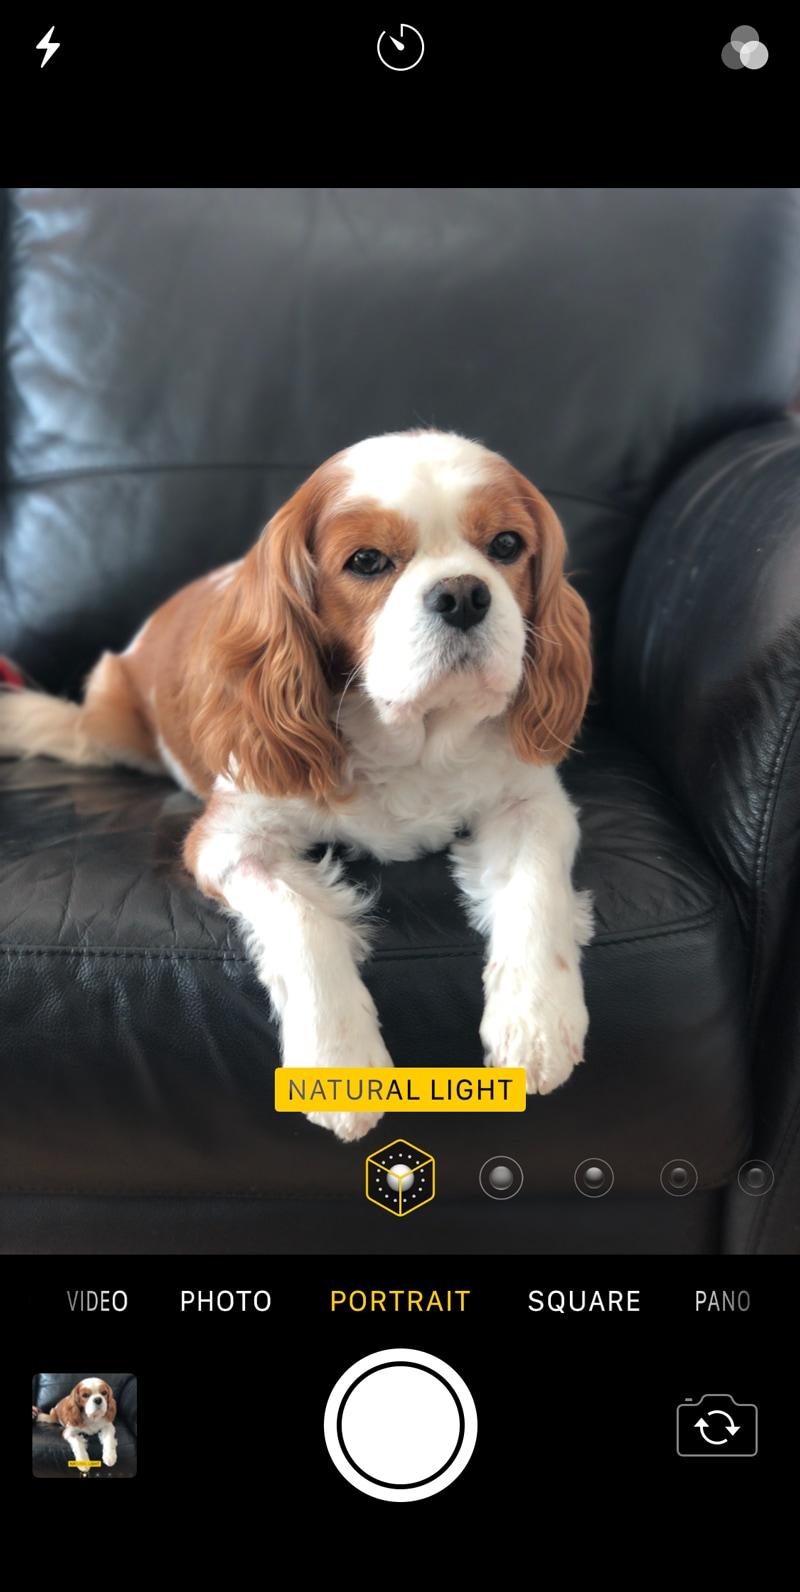 screenshot of iPhone showing a dog